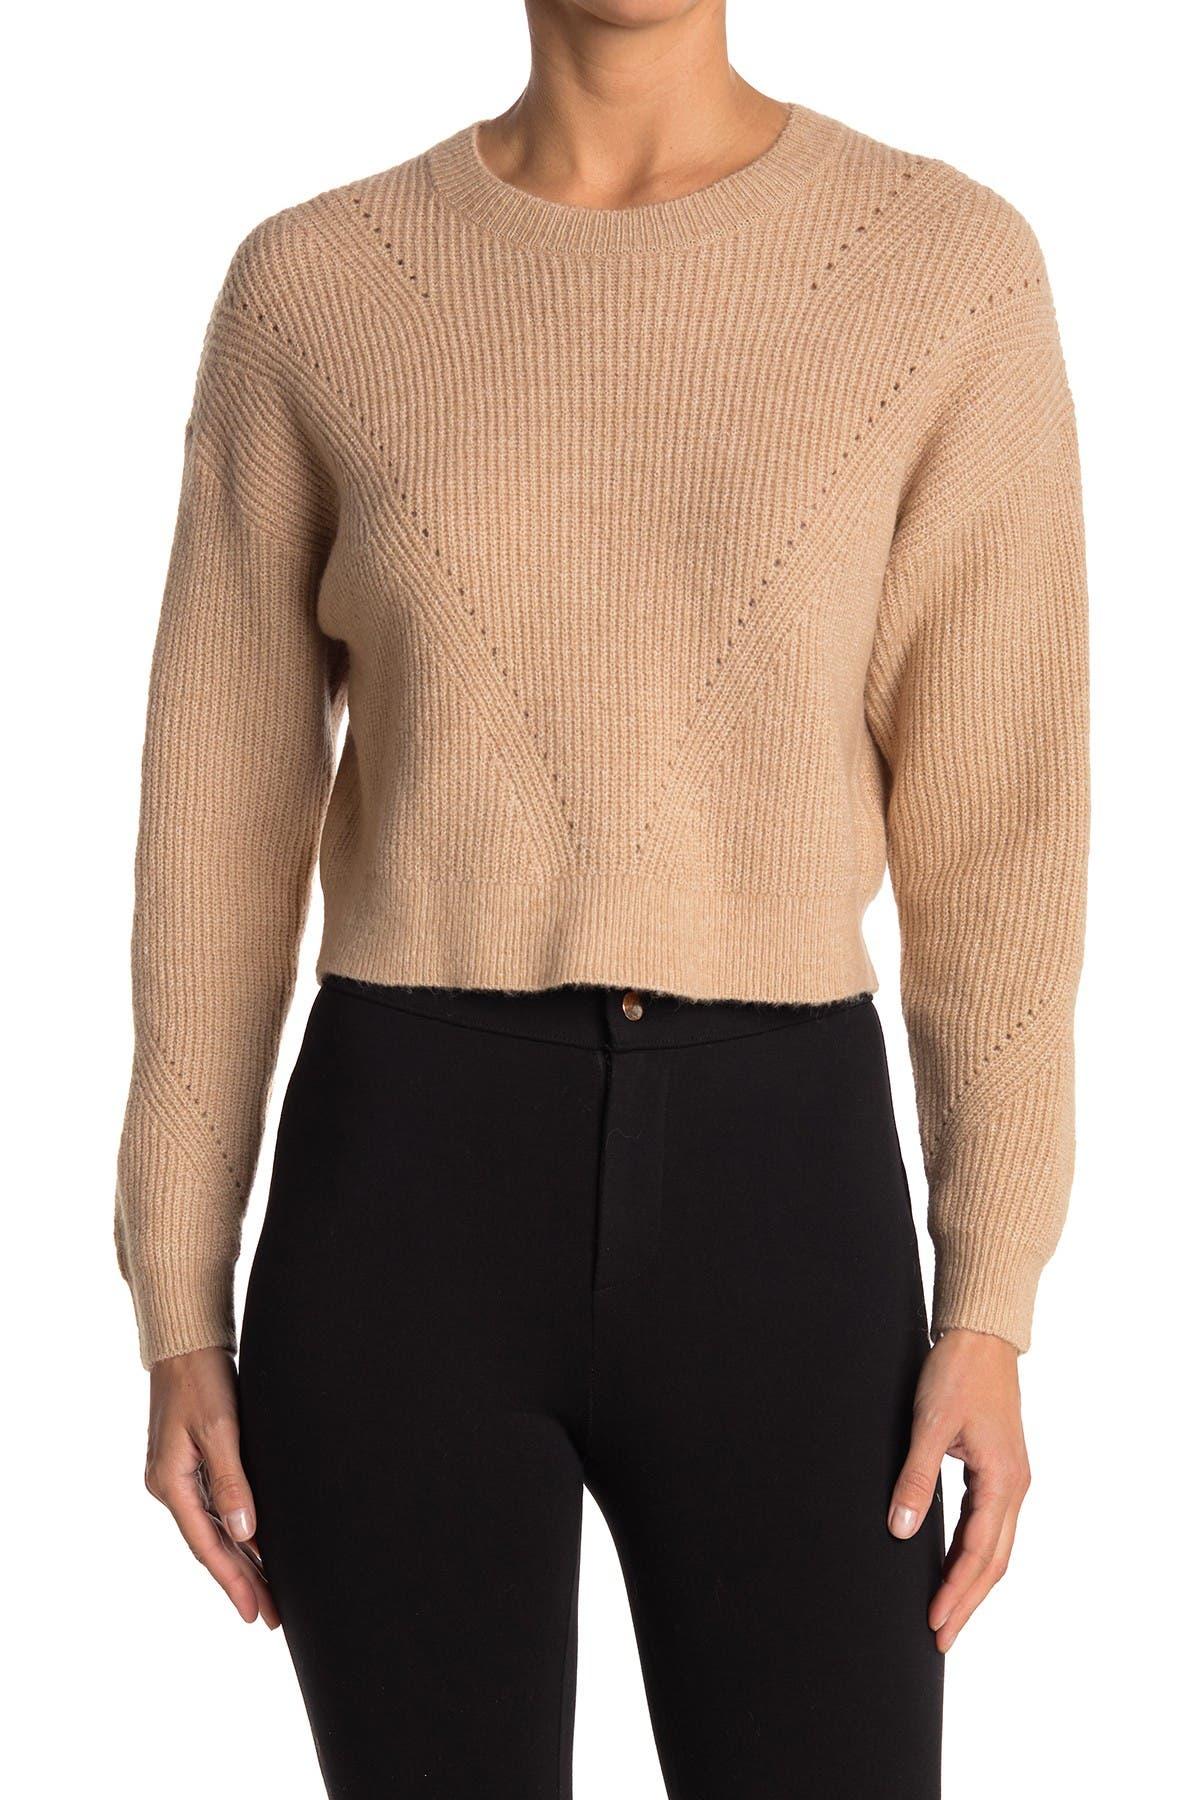 Image of Elodie Crew Neck Crop Pullover Sweater